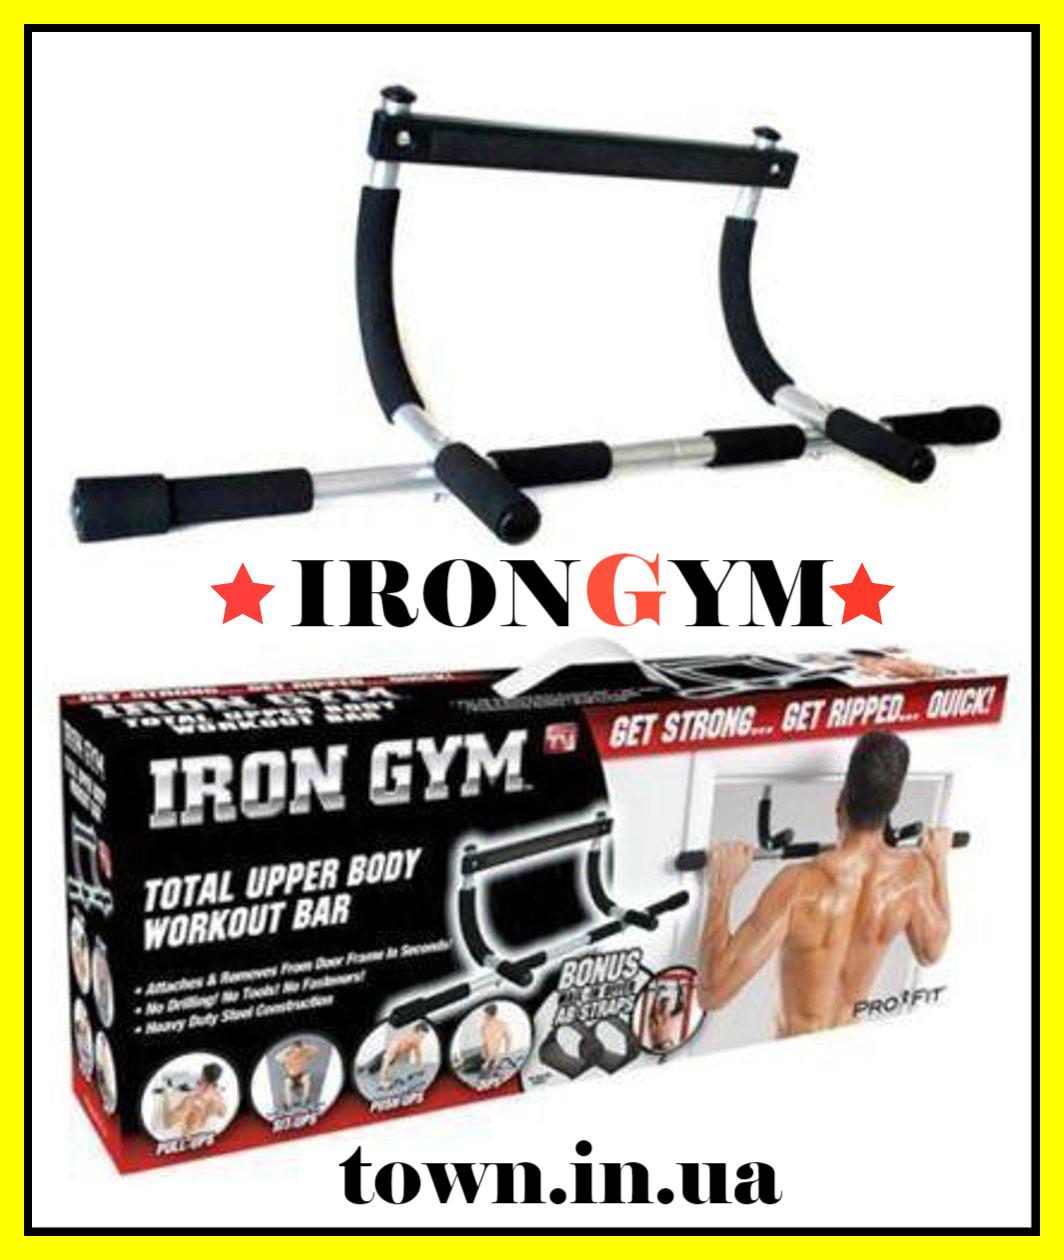 Домашний турник Iron Gym. Тренажер Айрон Джим